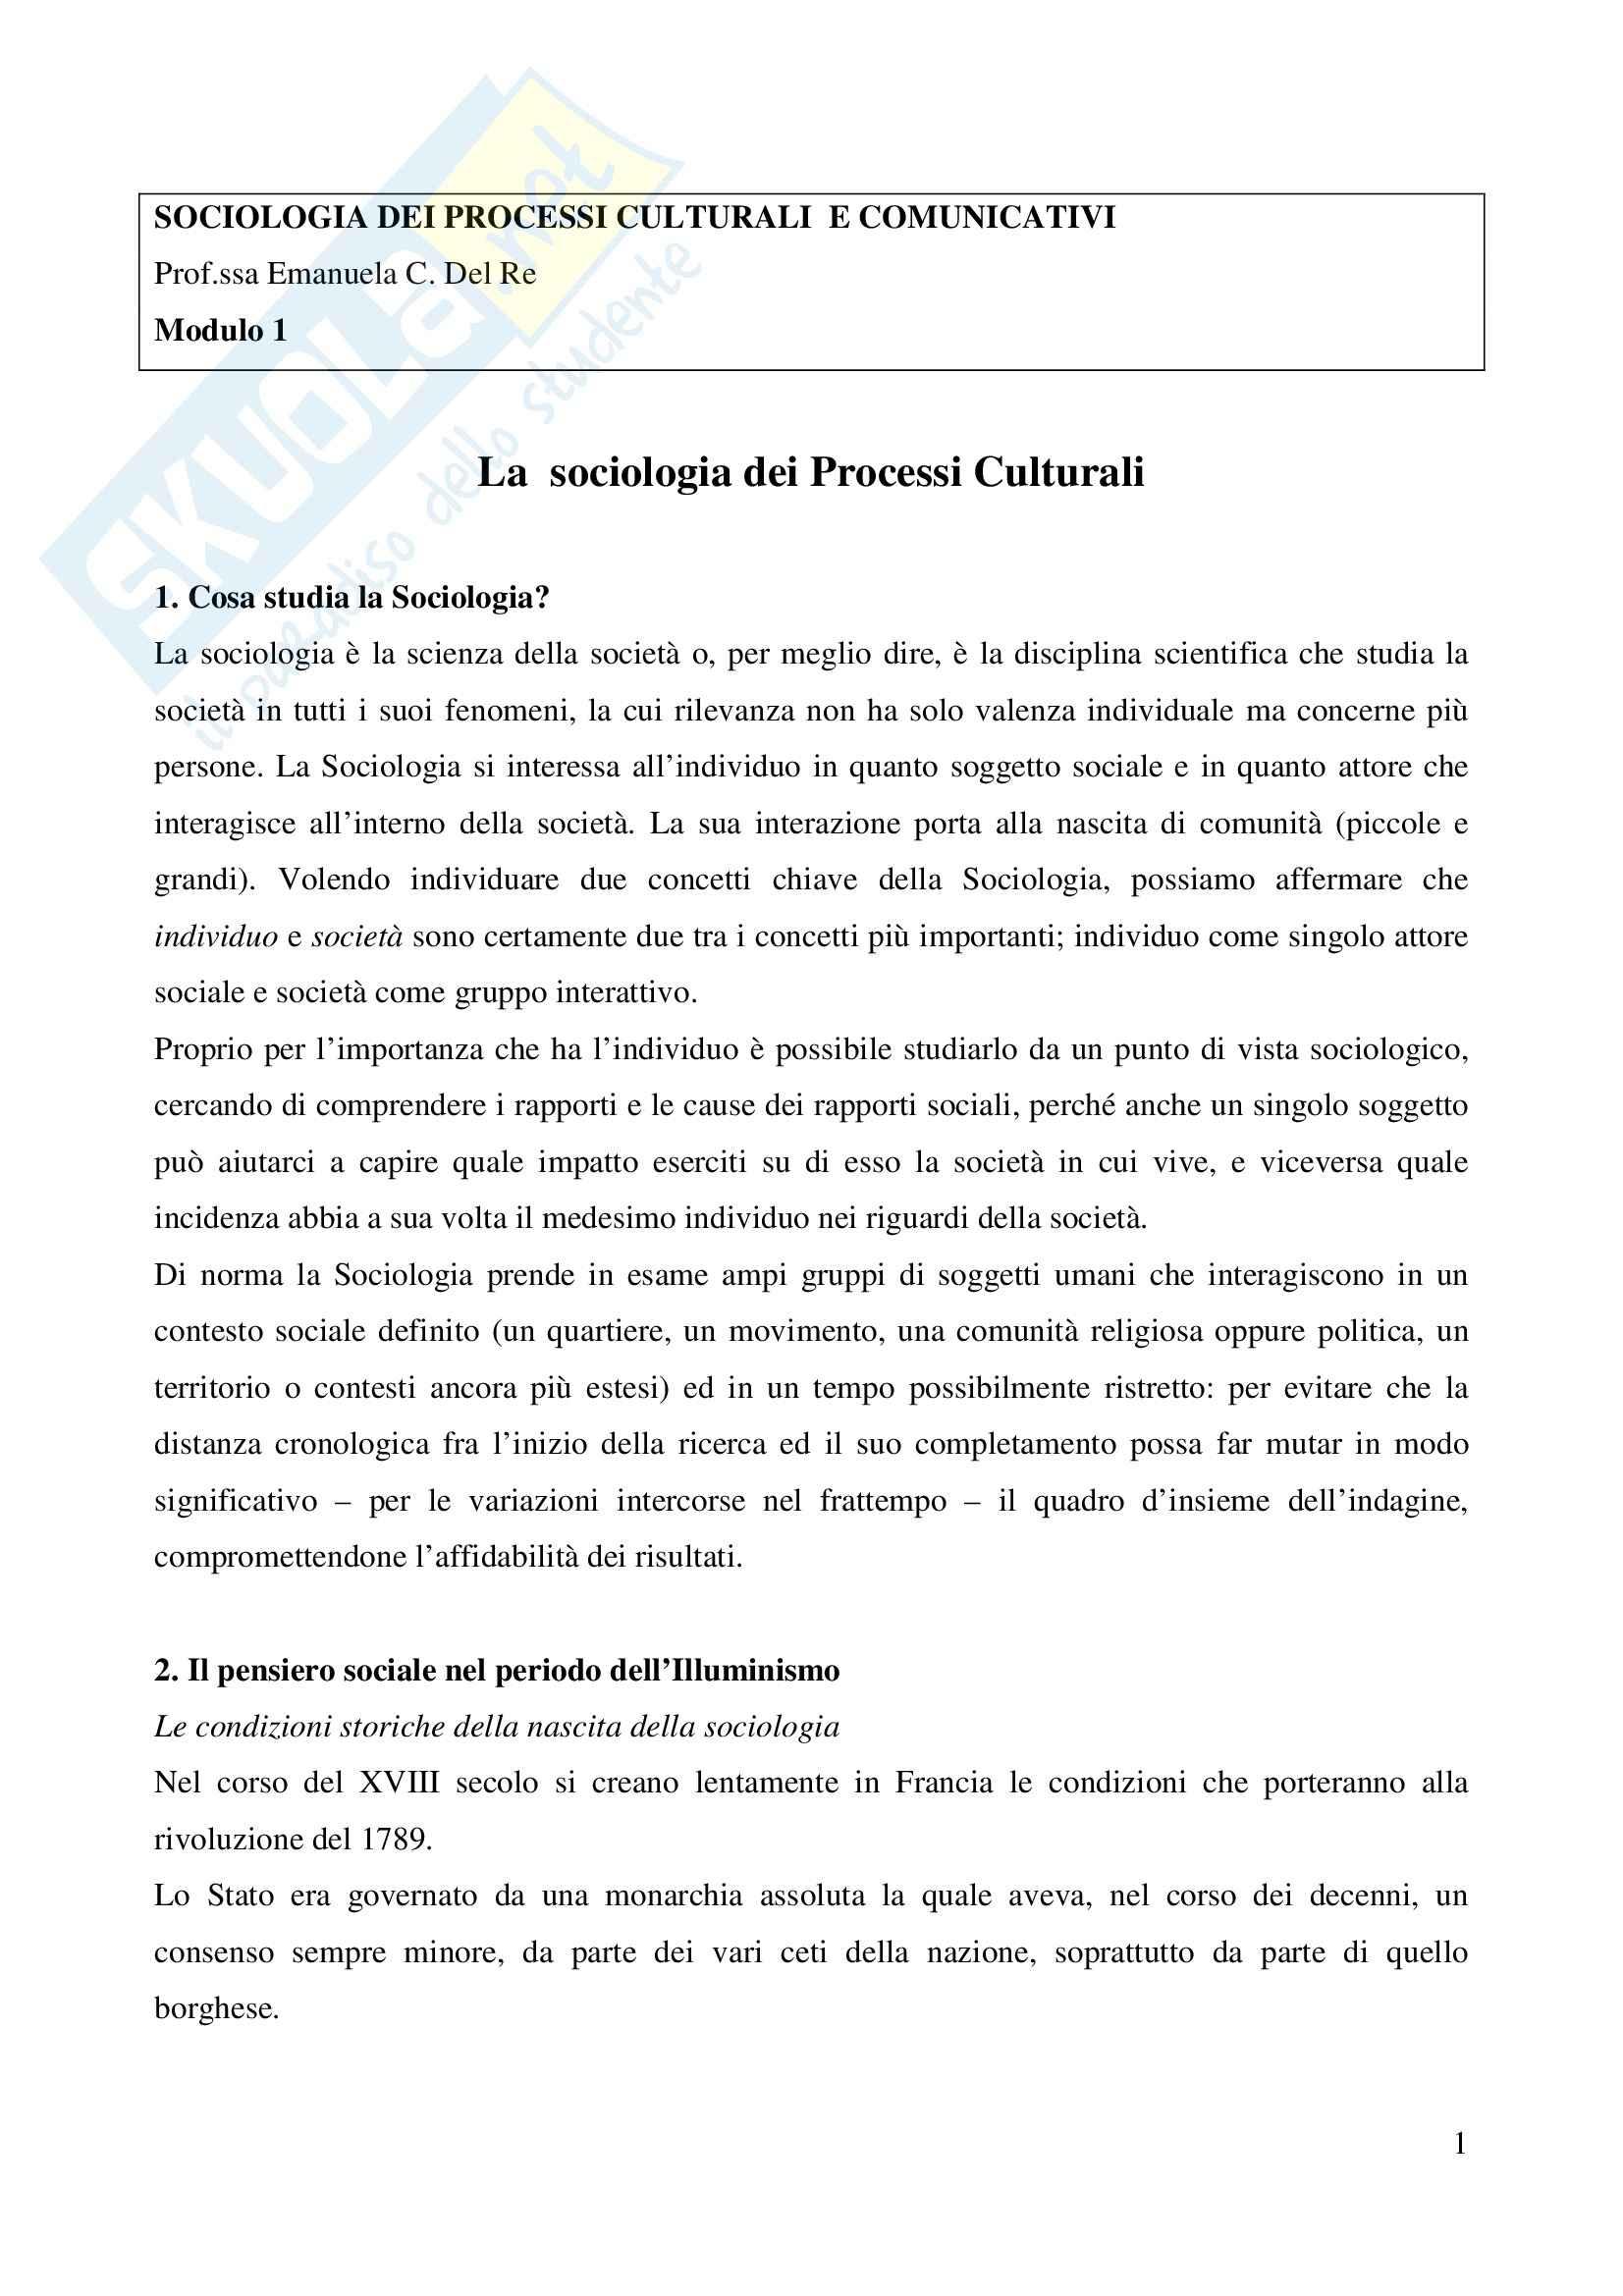 Sociologia dei processi culturali - Introduzione